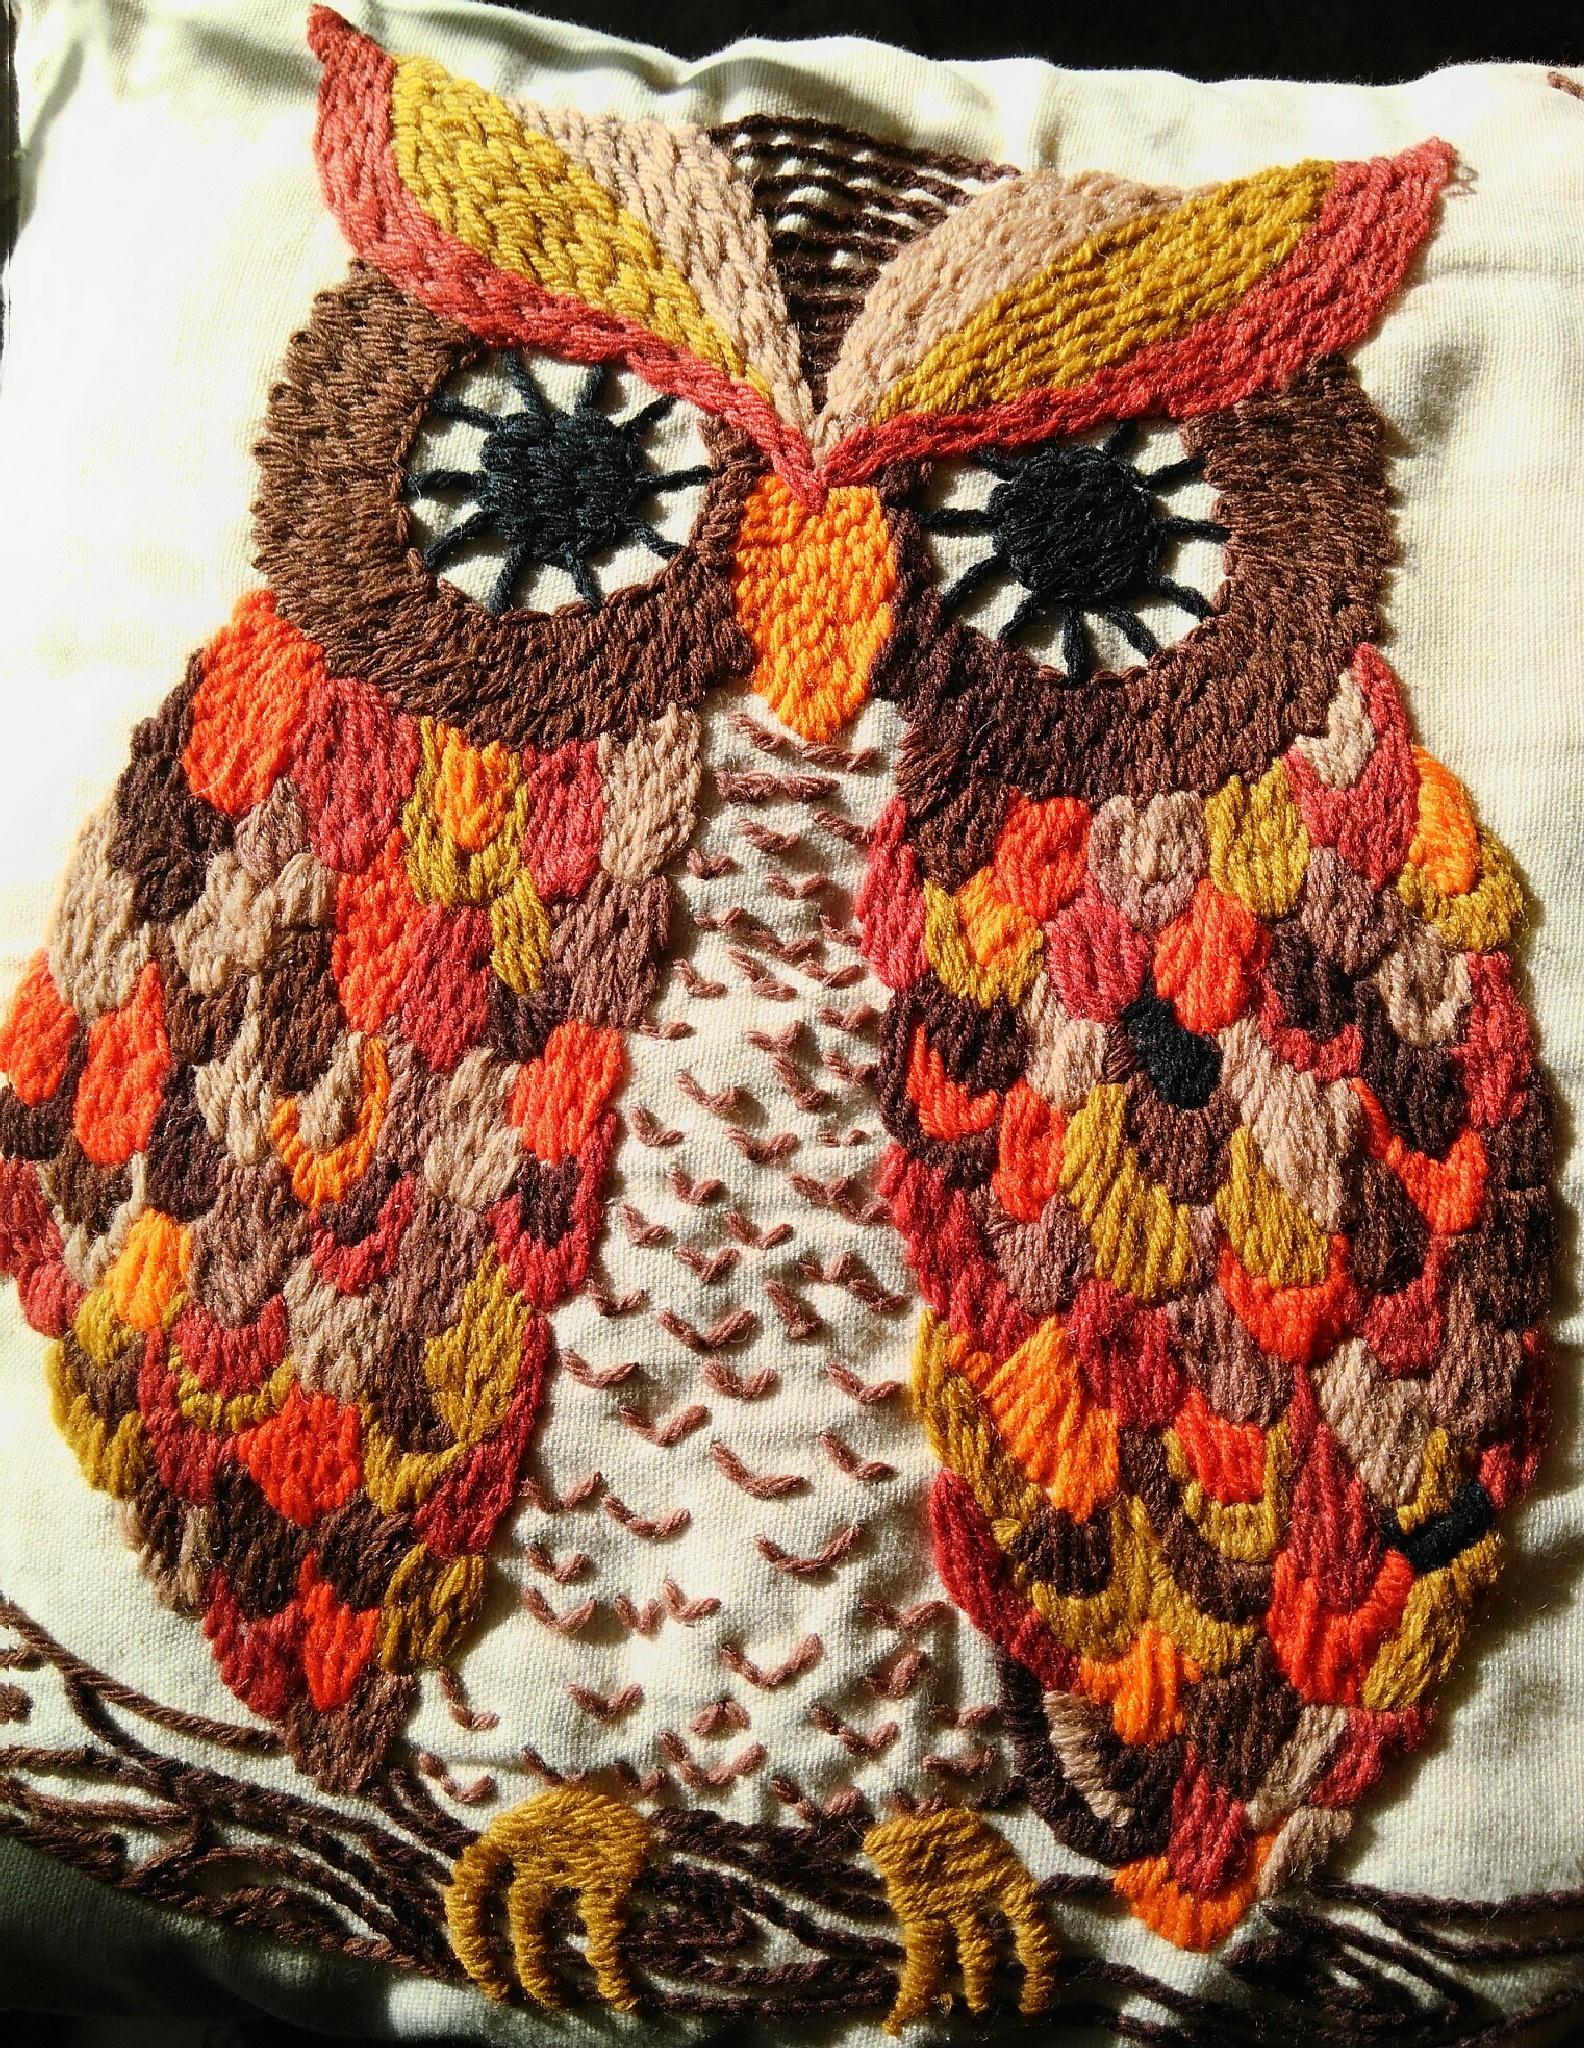 Macro The Big Owl by Lorenzo (Larry) Jonree